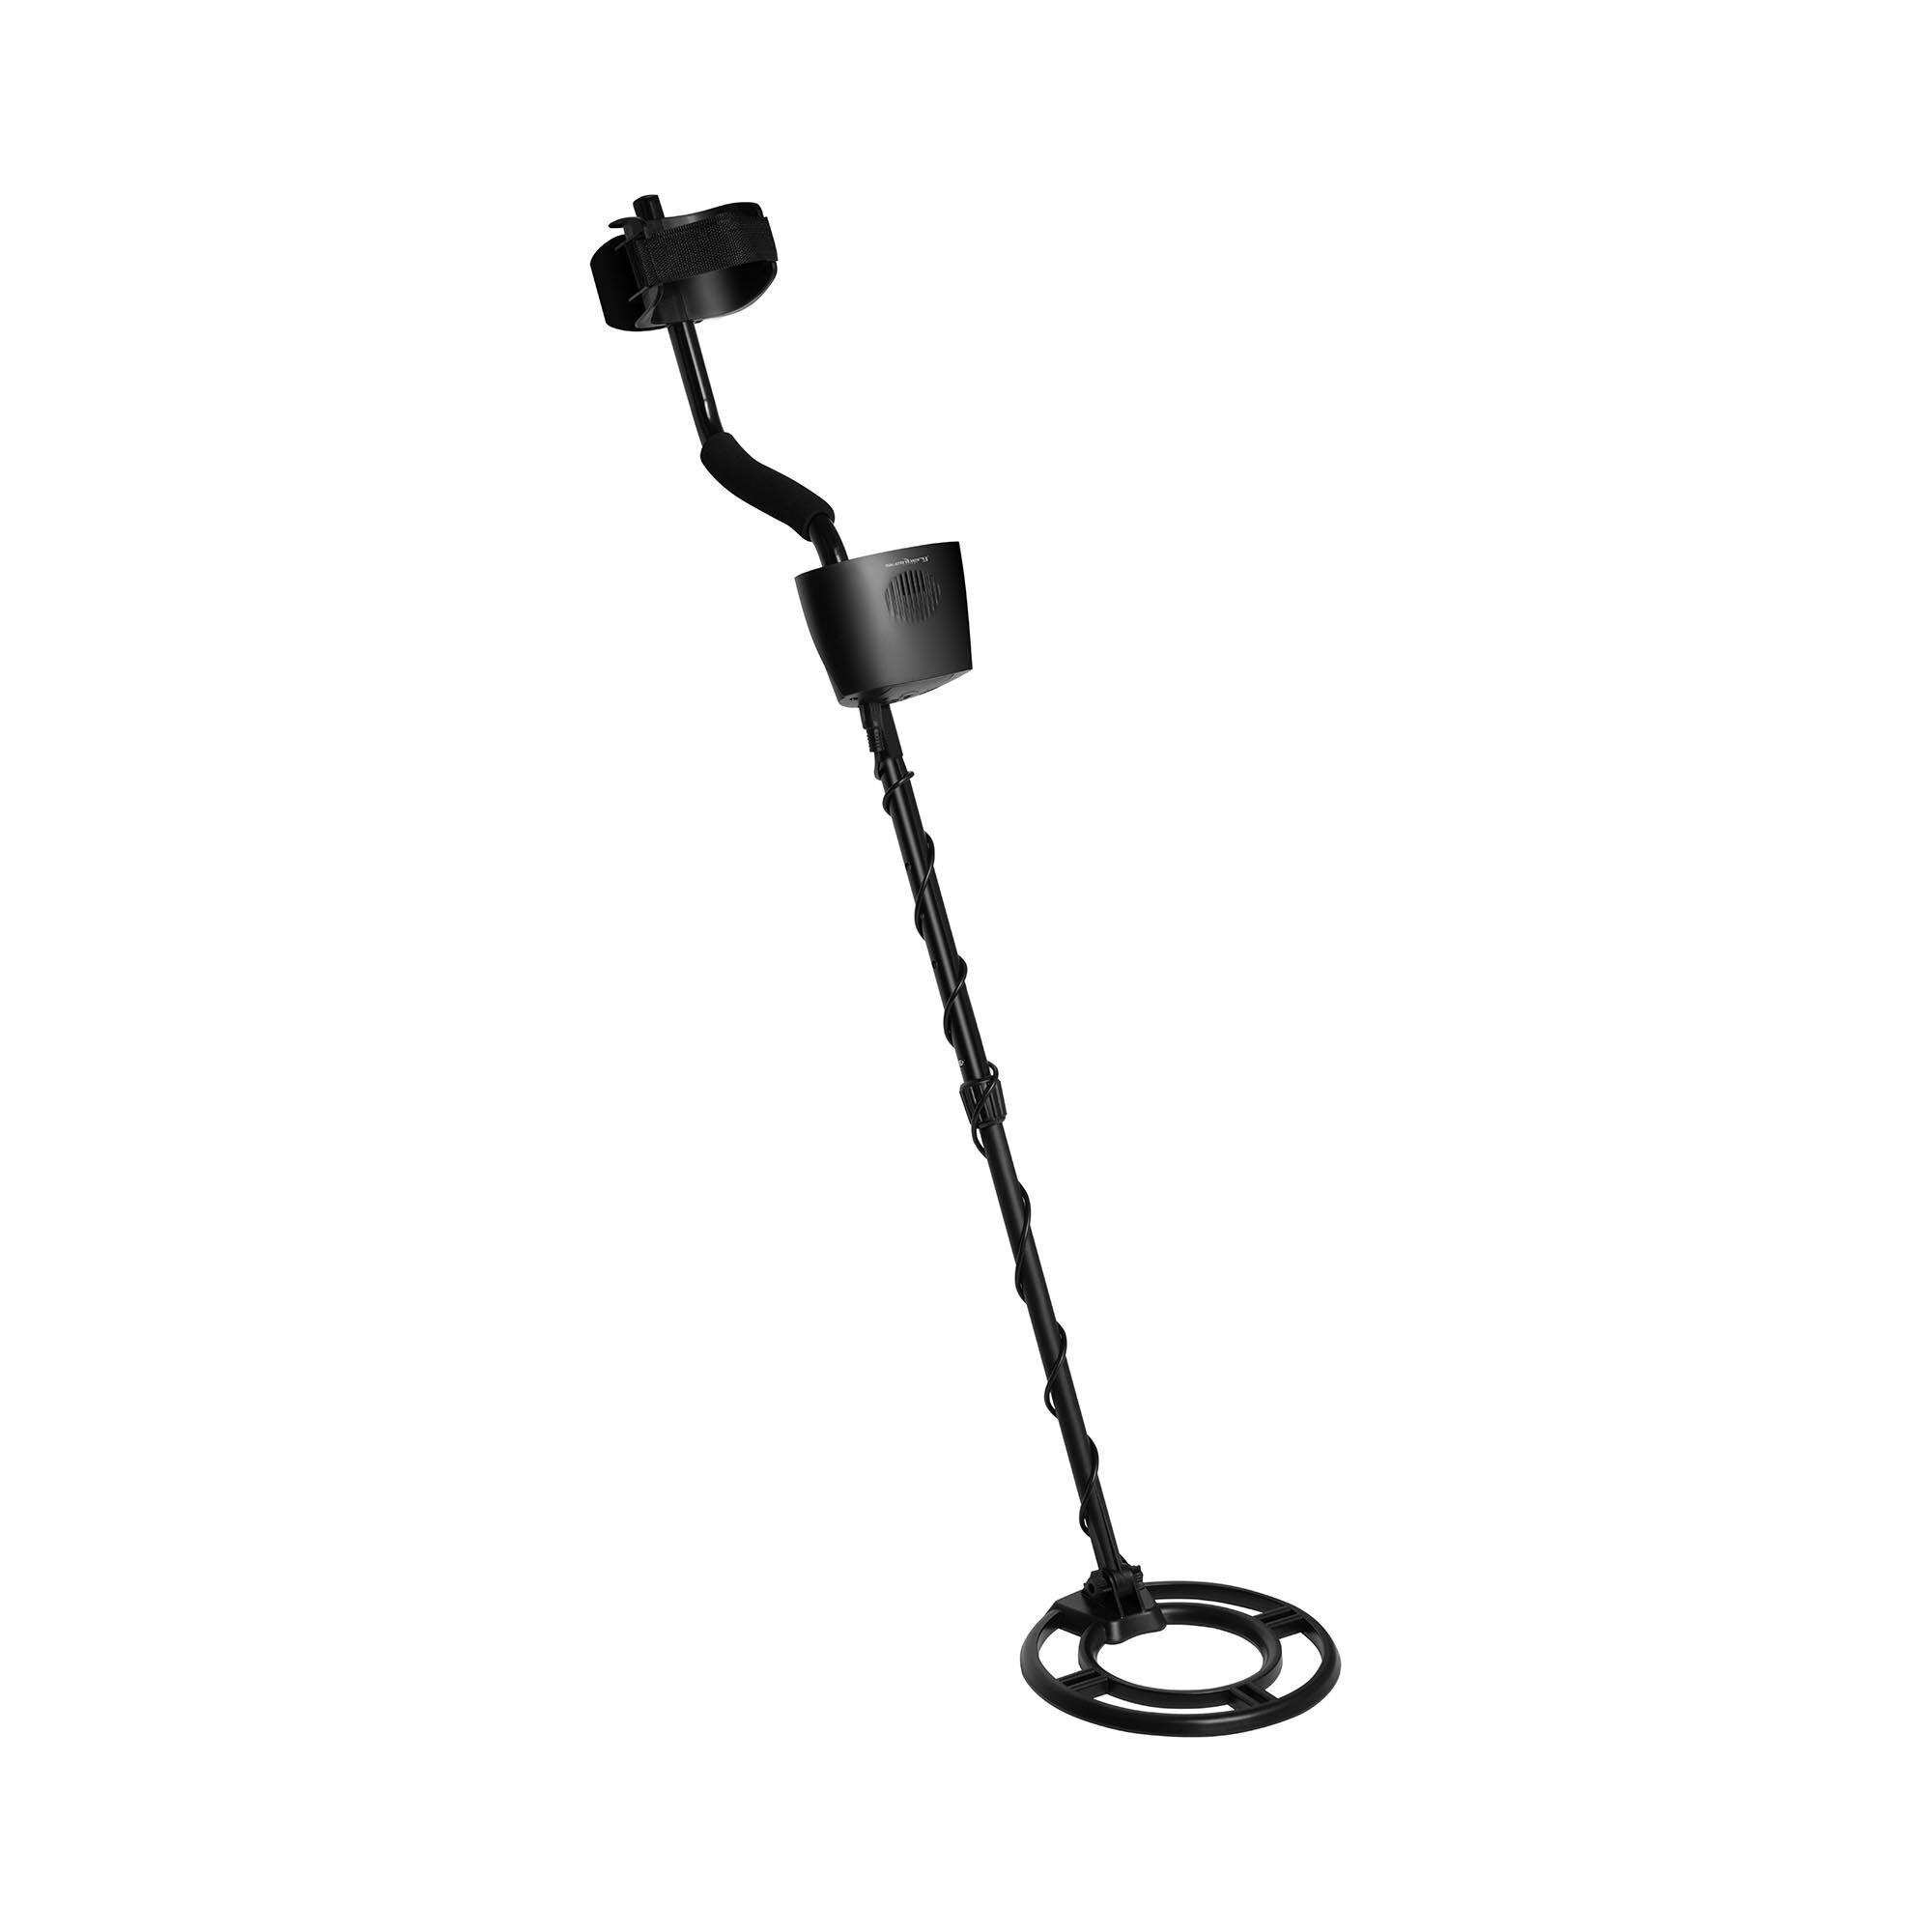 Steinberg Metal detector professionale di profondità - 100 cm / 20 cm - Ø 25 cm SBS-MD-15